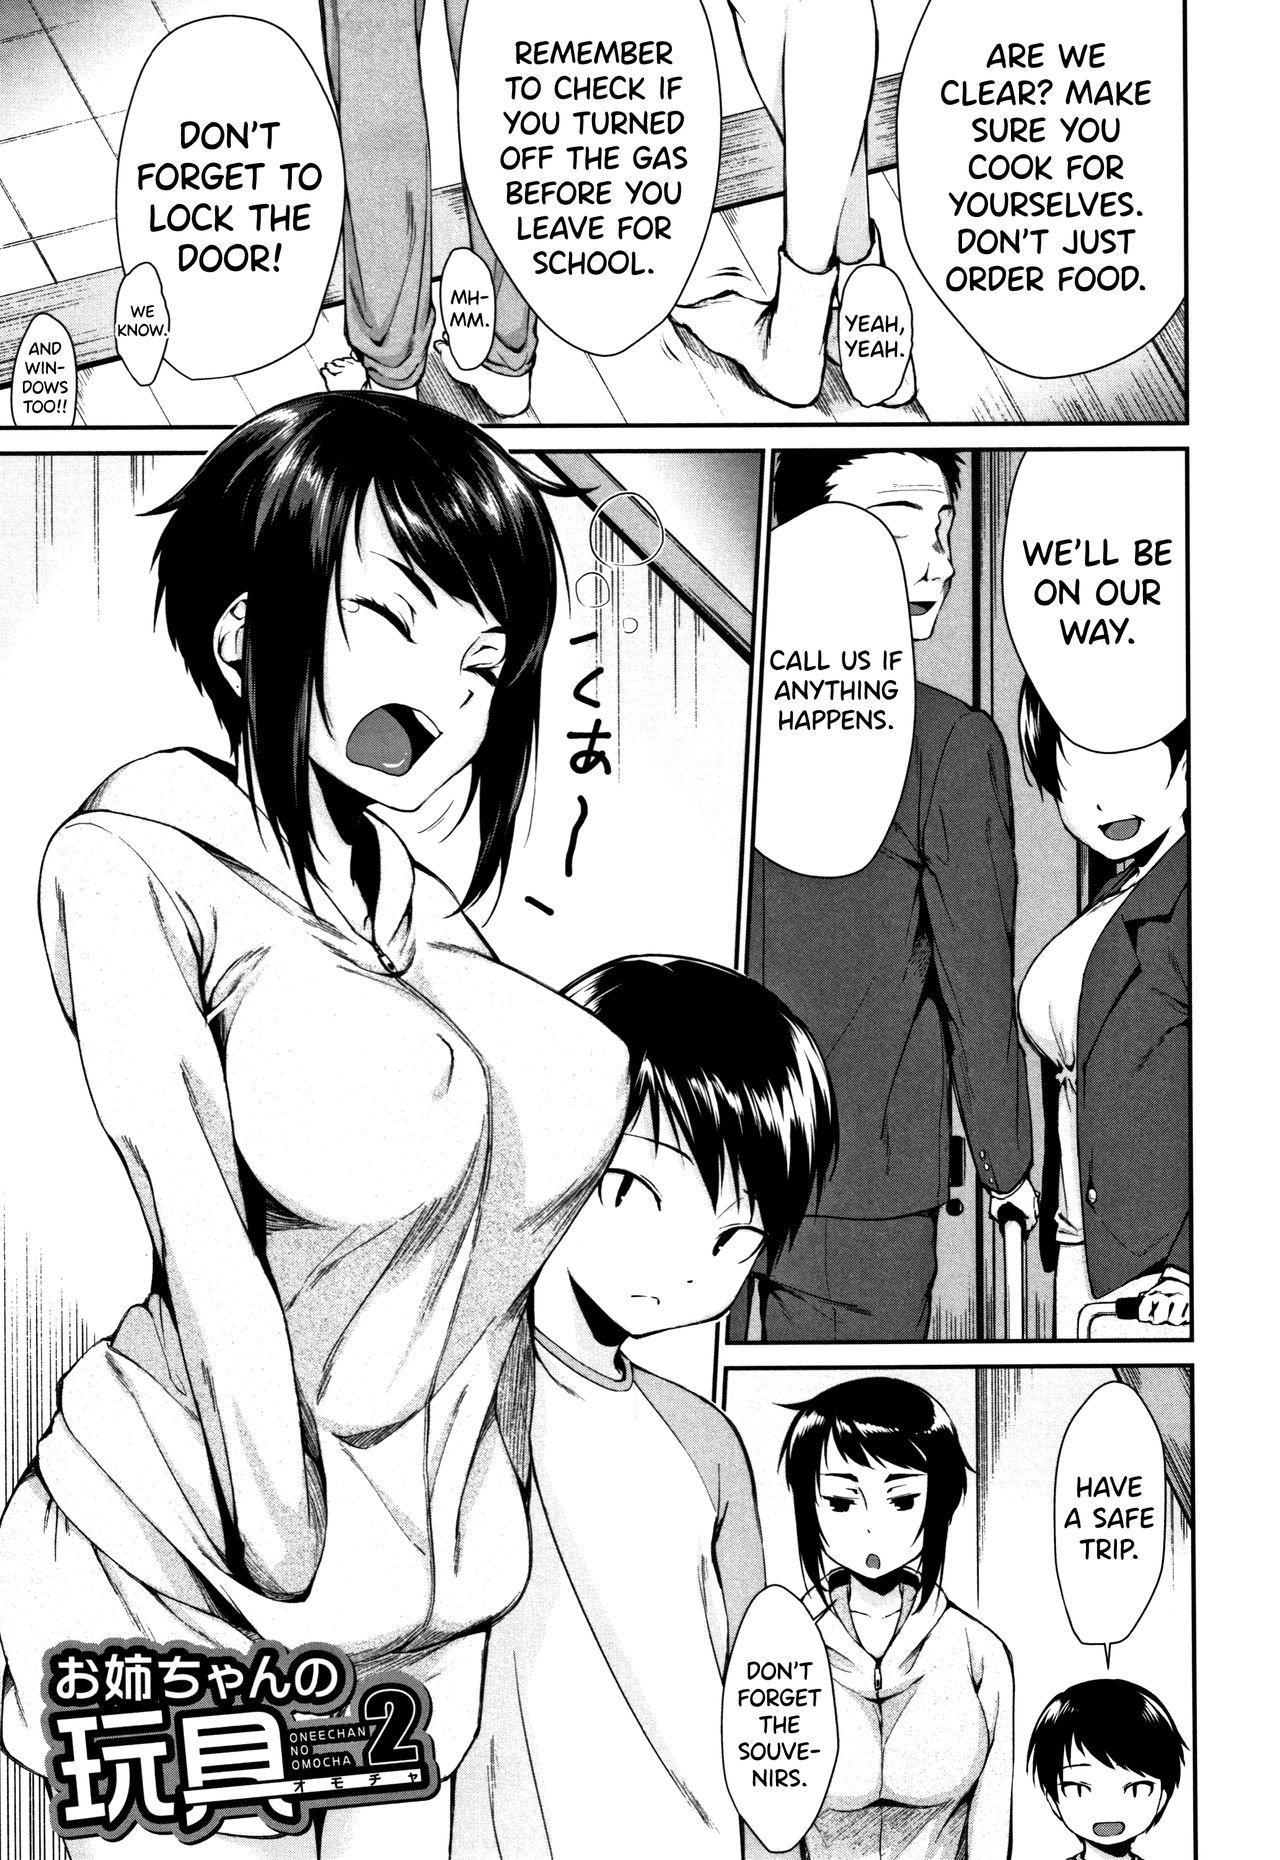 [Kurokura Eri] Onee-chan to Issho! Ch.1-4 [English] [biribiri] 38